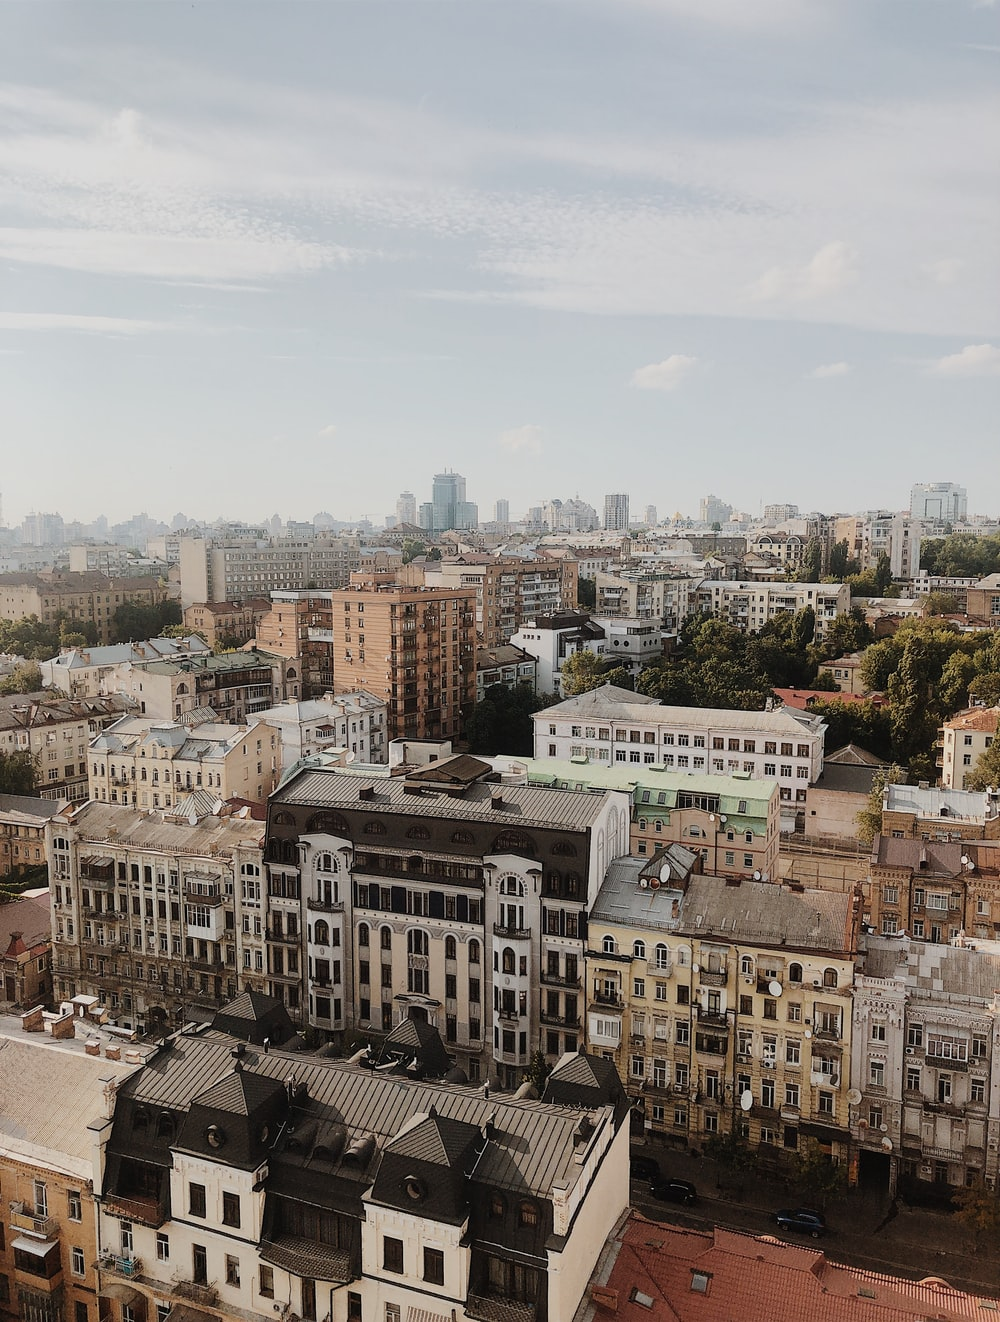 cityscape photo at daytime